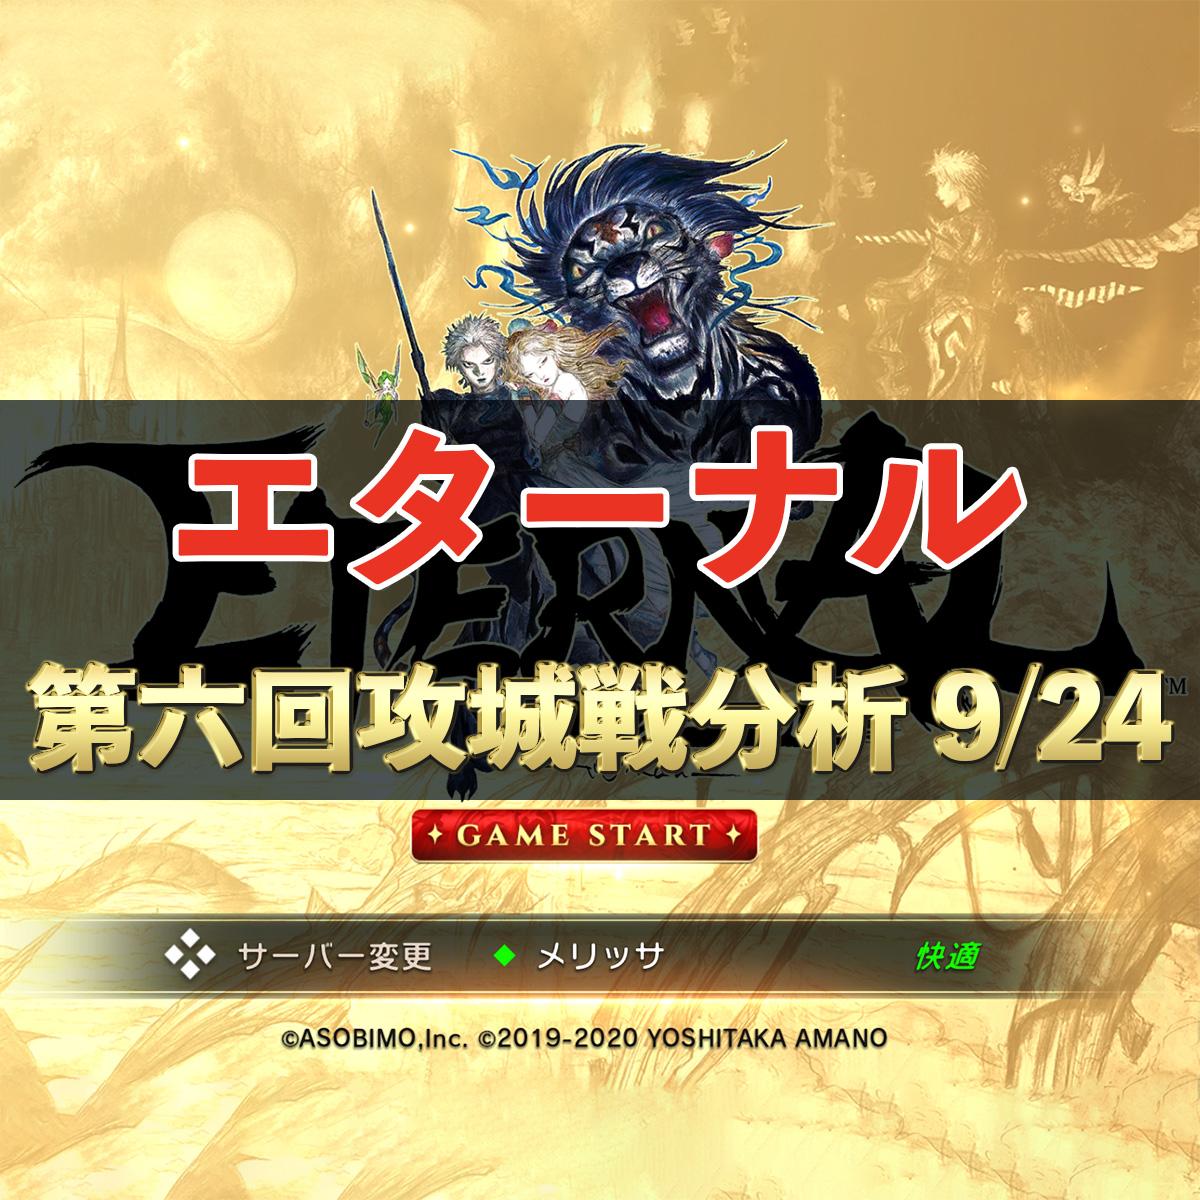 【エターナル】9/24調査! 第六回攻城戦 参加軍団徹底分析!